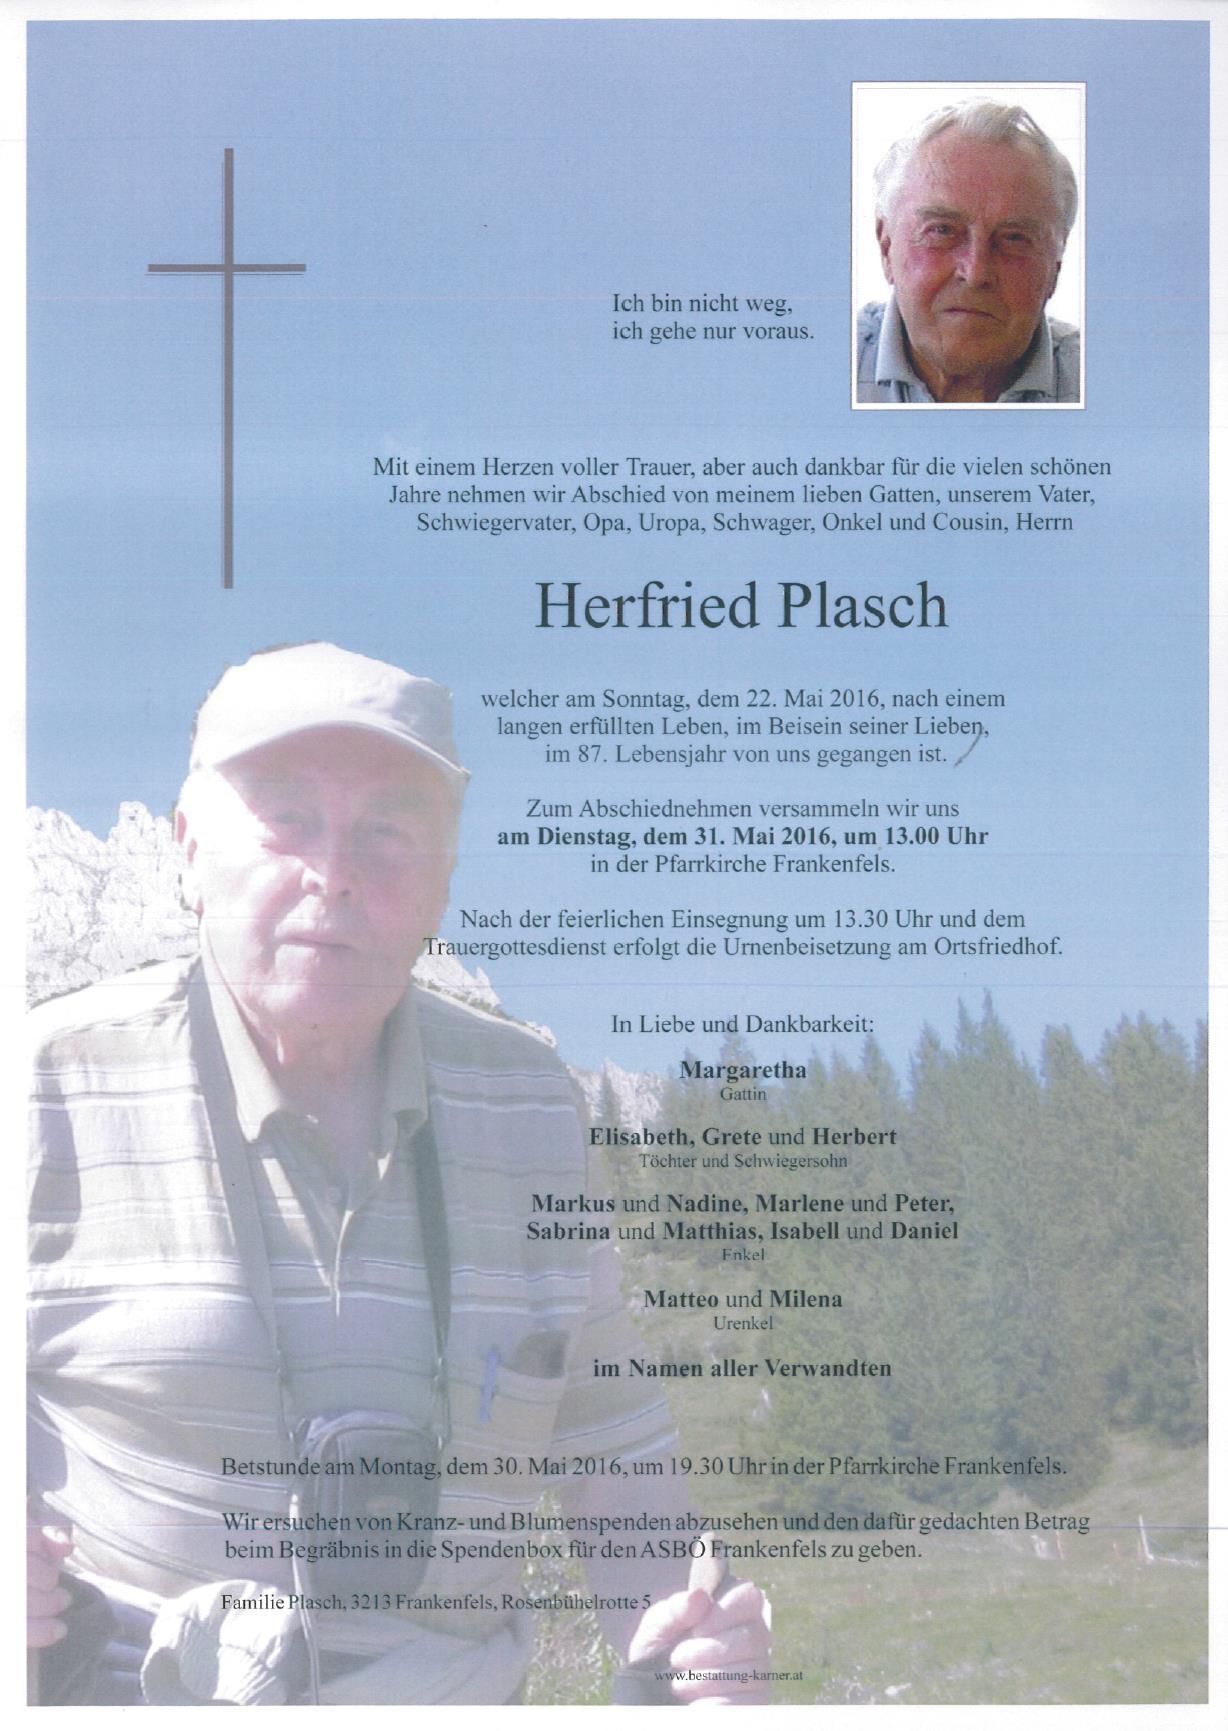 Herfried Plasch